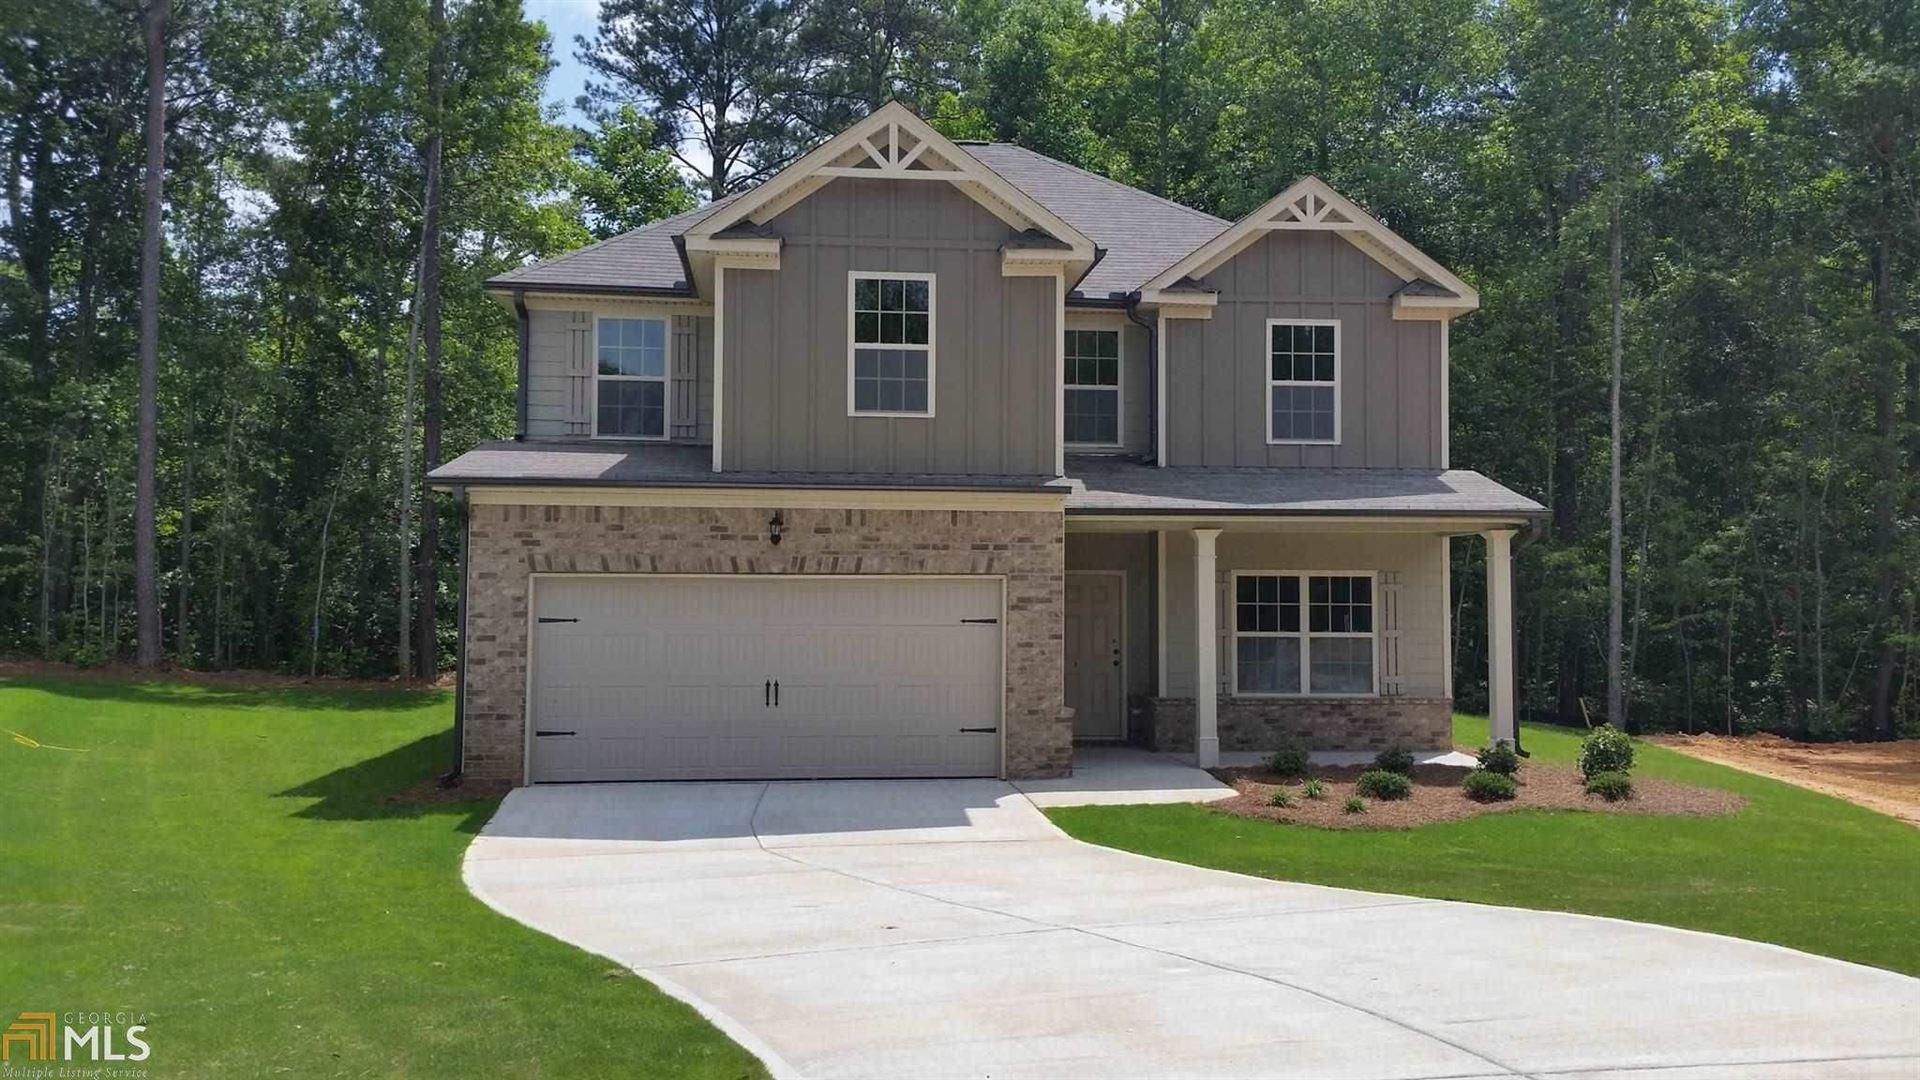 475 Stanebrook Ct Lot 27, Jackson, GA 30233 - #: 8813856